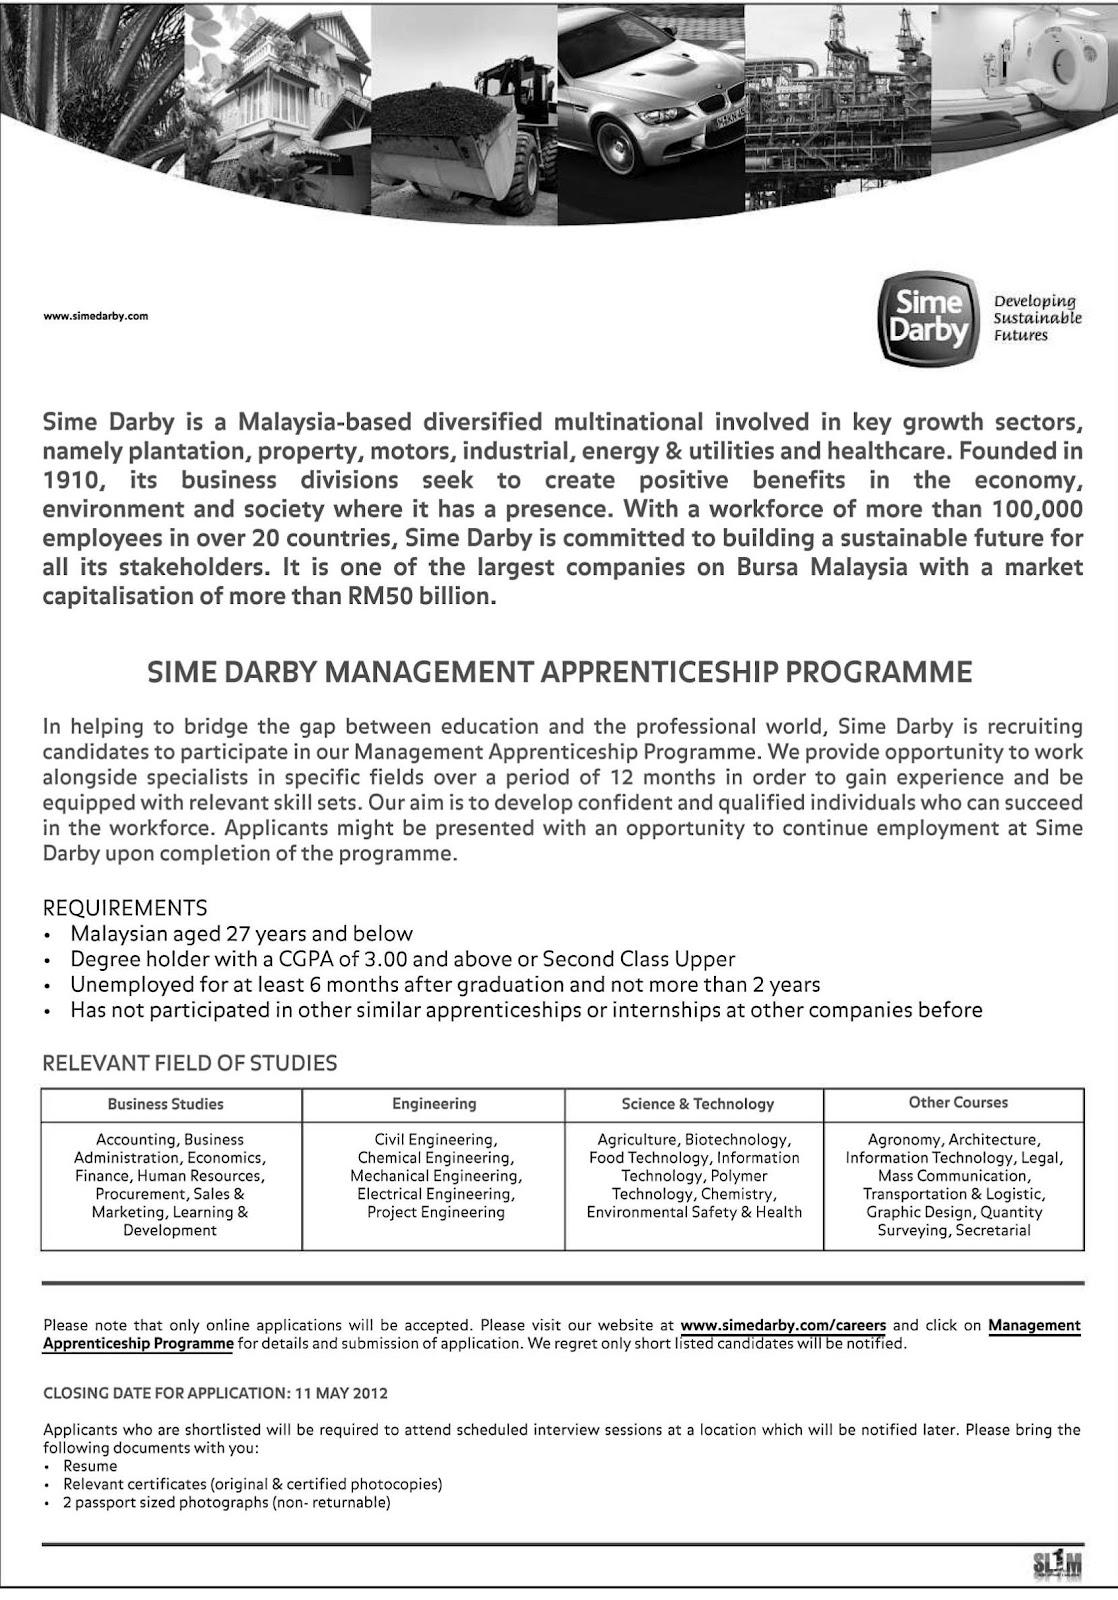 Sime Darby Management Apprenticeship Programme Terkini